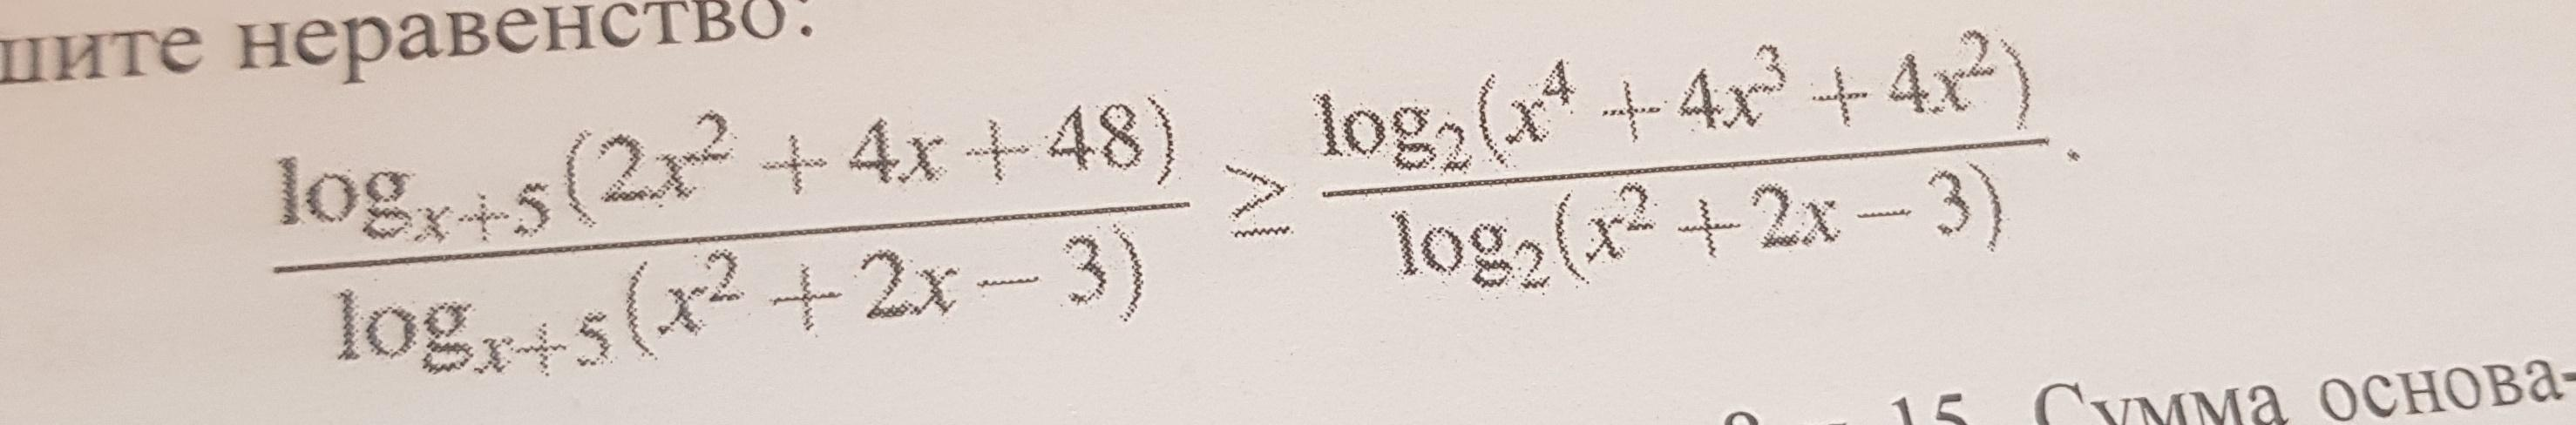 Решите неравенство. Logx+5(2x+4x+48).......